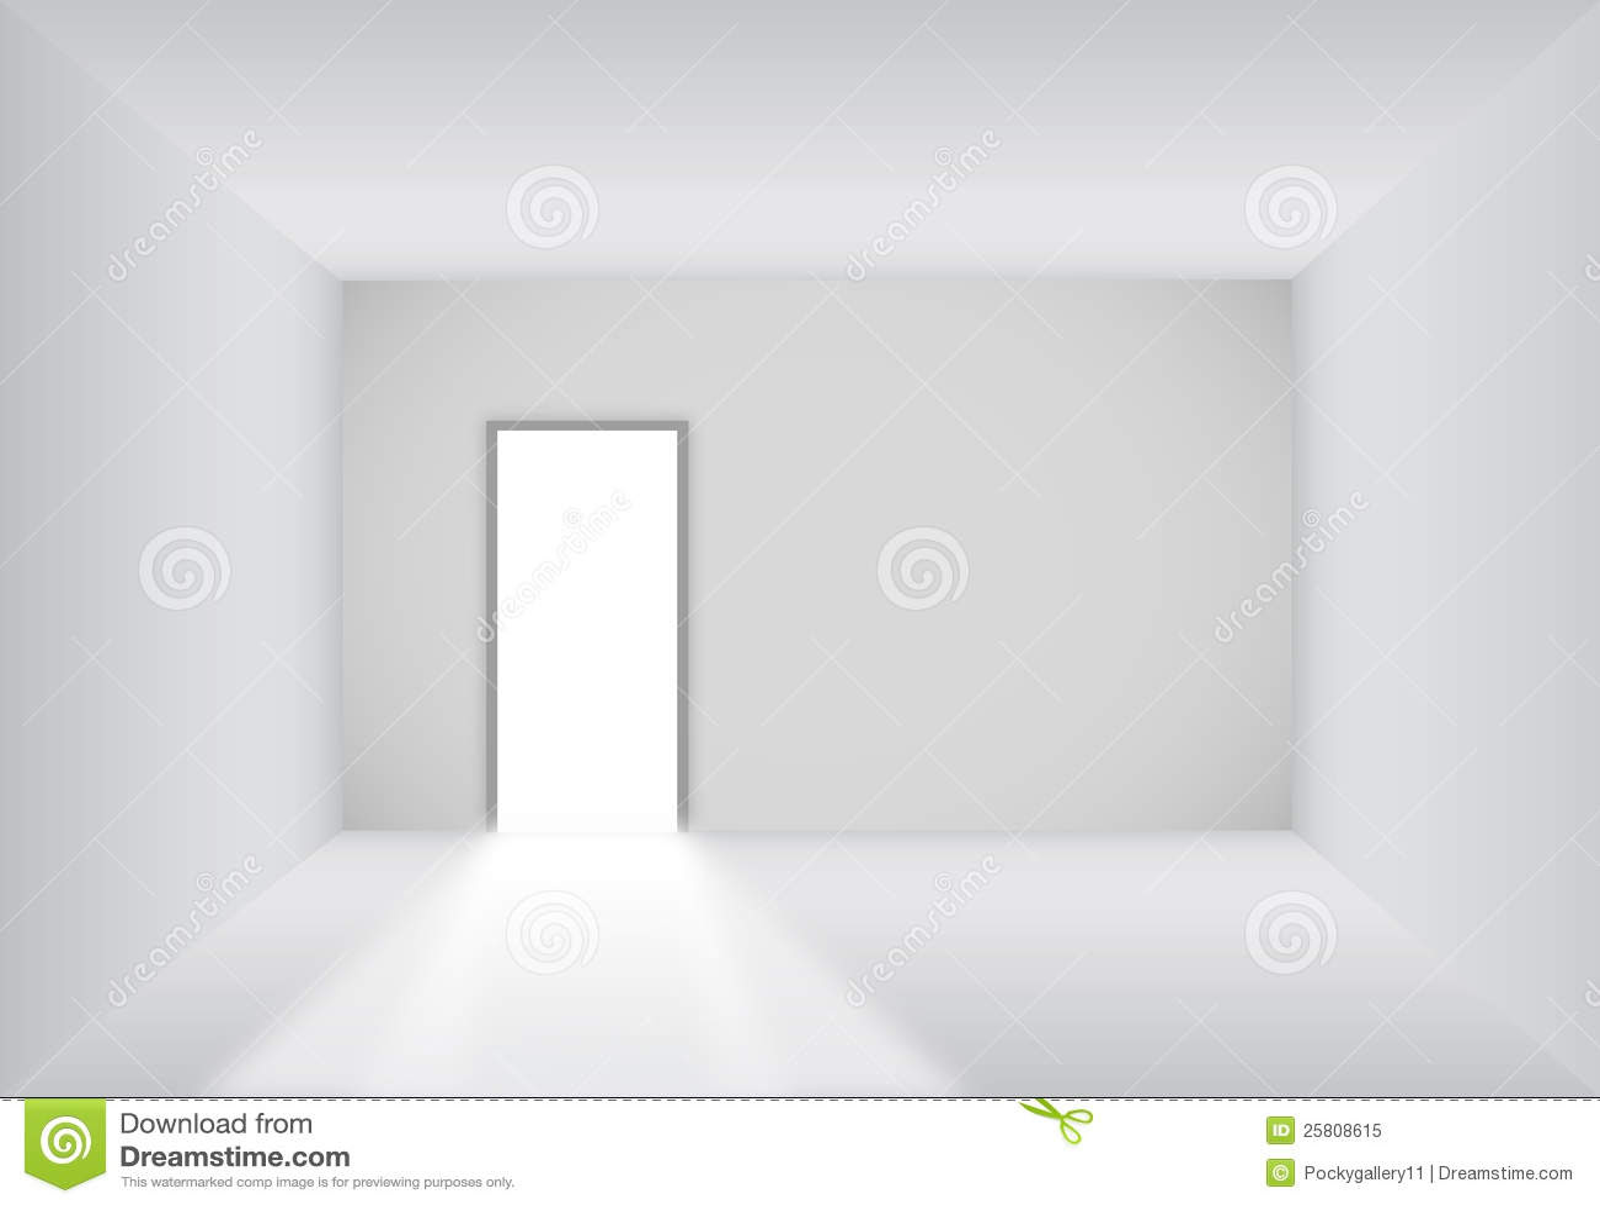 Blank Room With Open Door Royalty Free Stock Photo - Image: 25808615